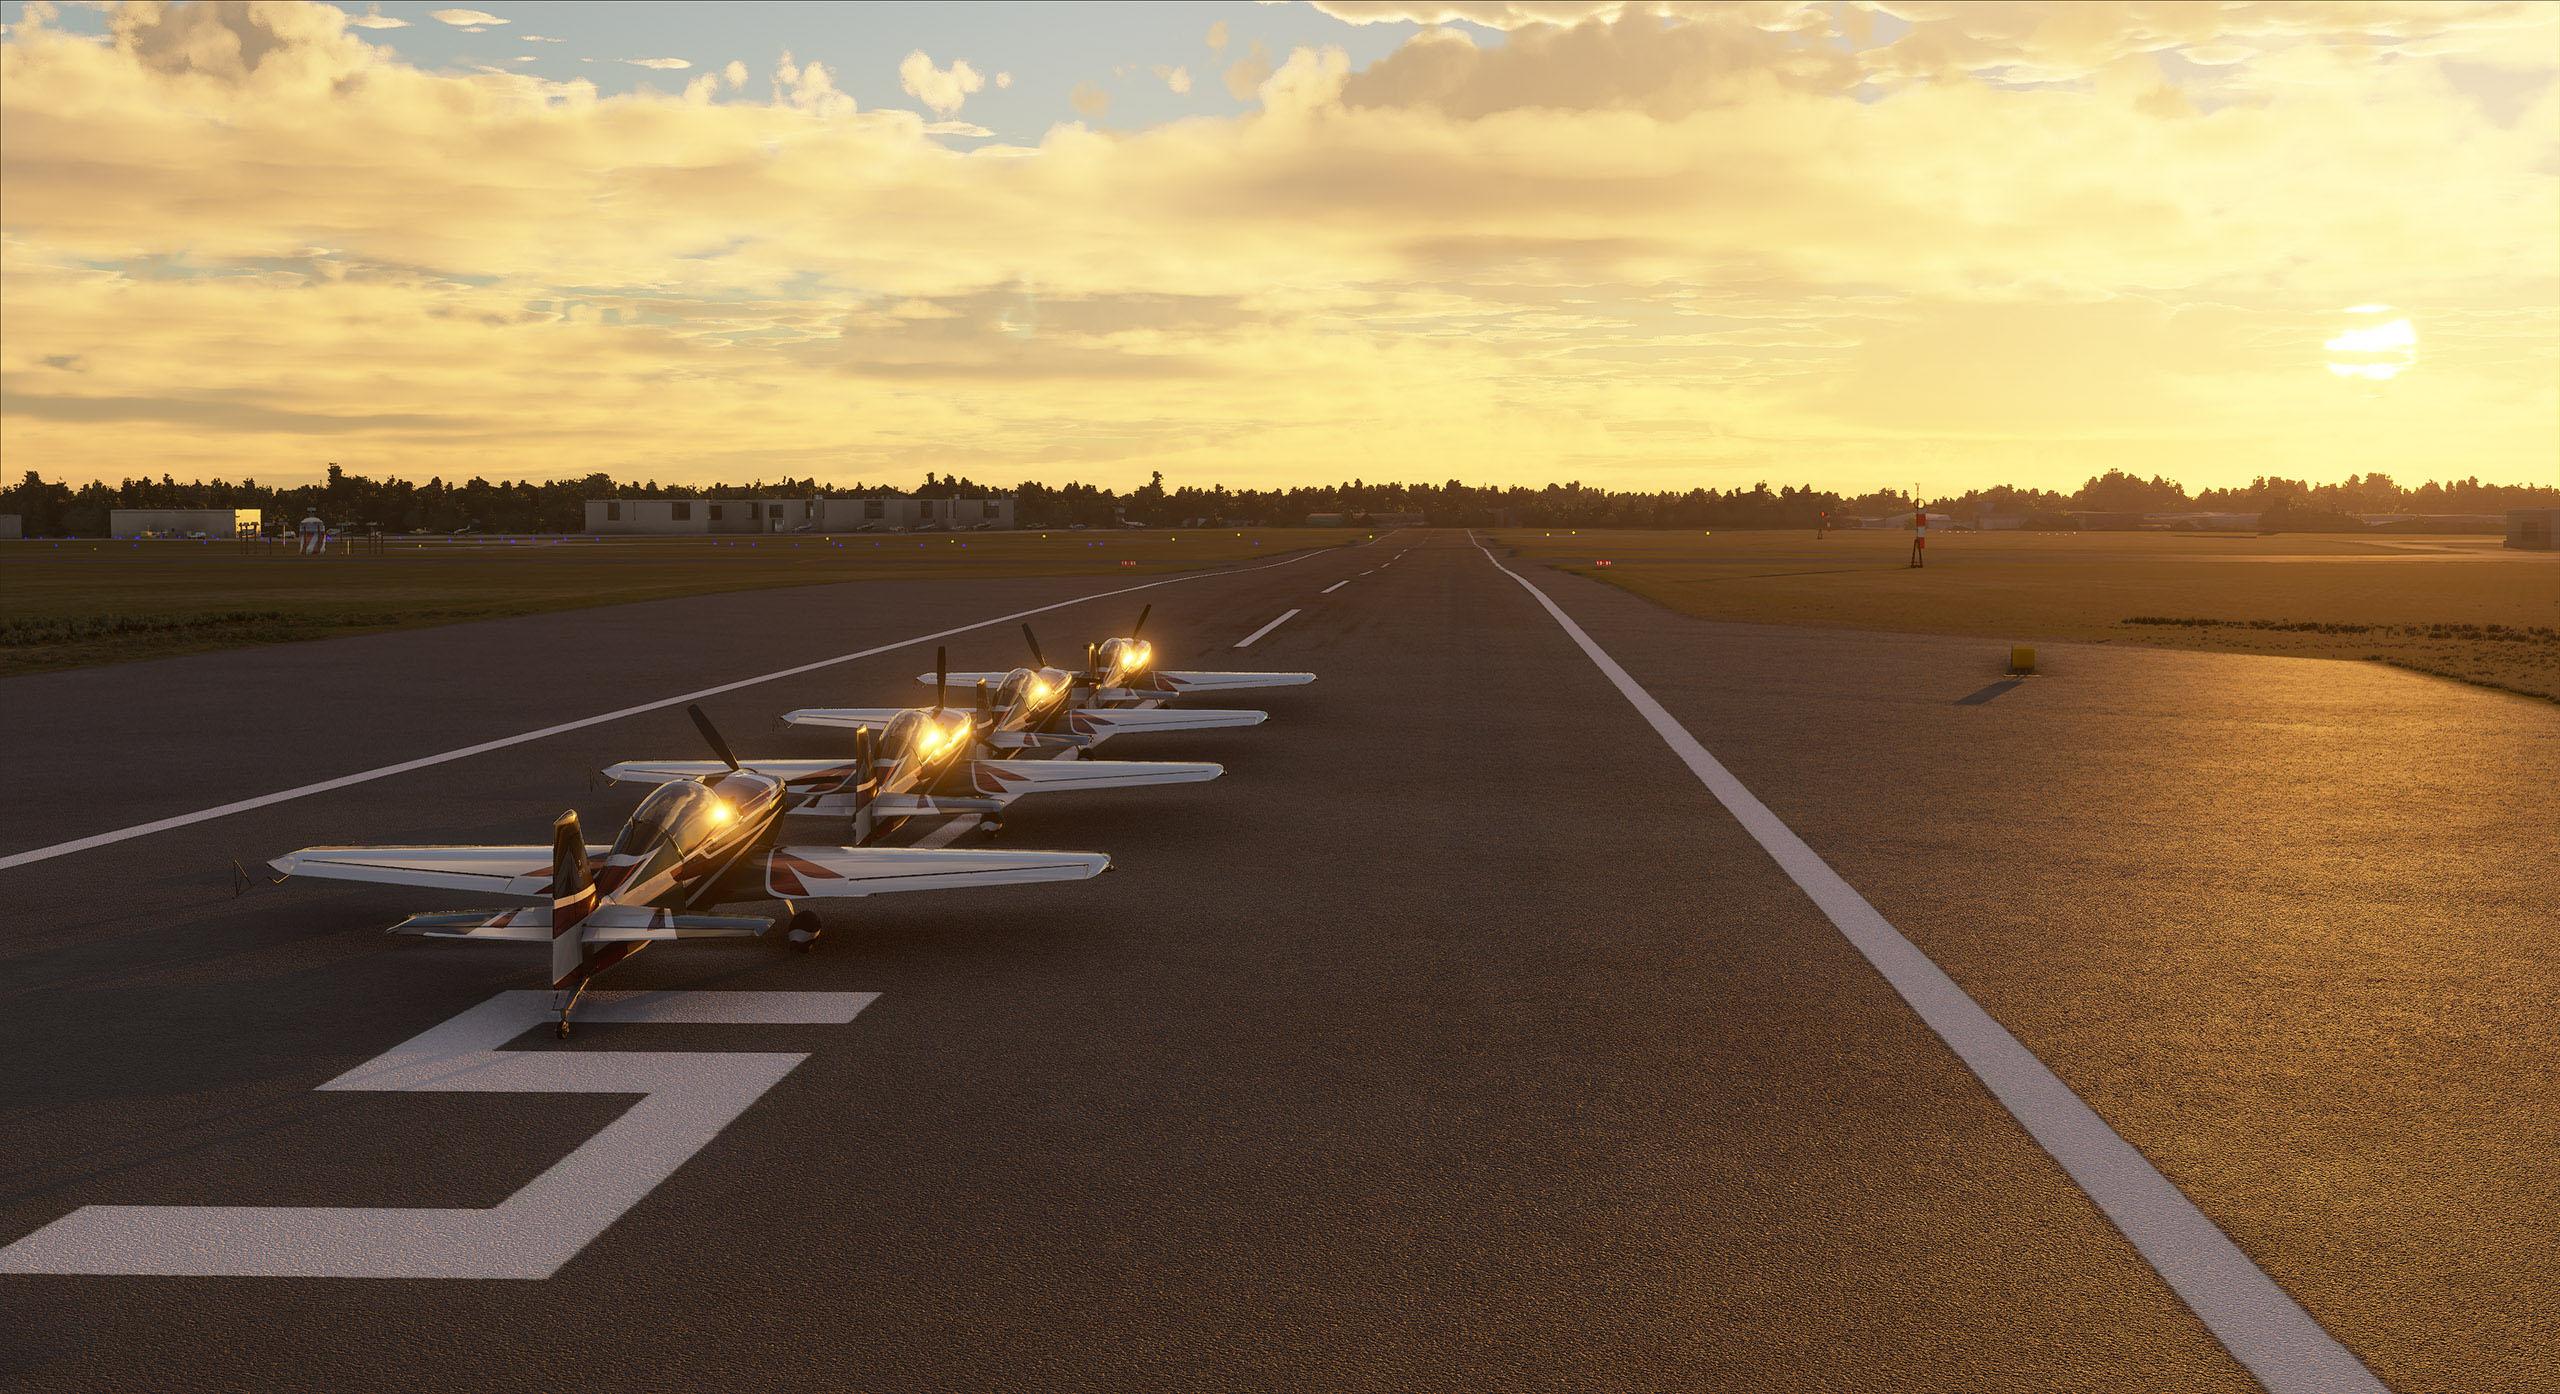 microsoft flight simulator 2020 patch notes 1.8.3.0 update